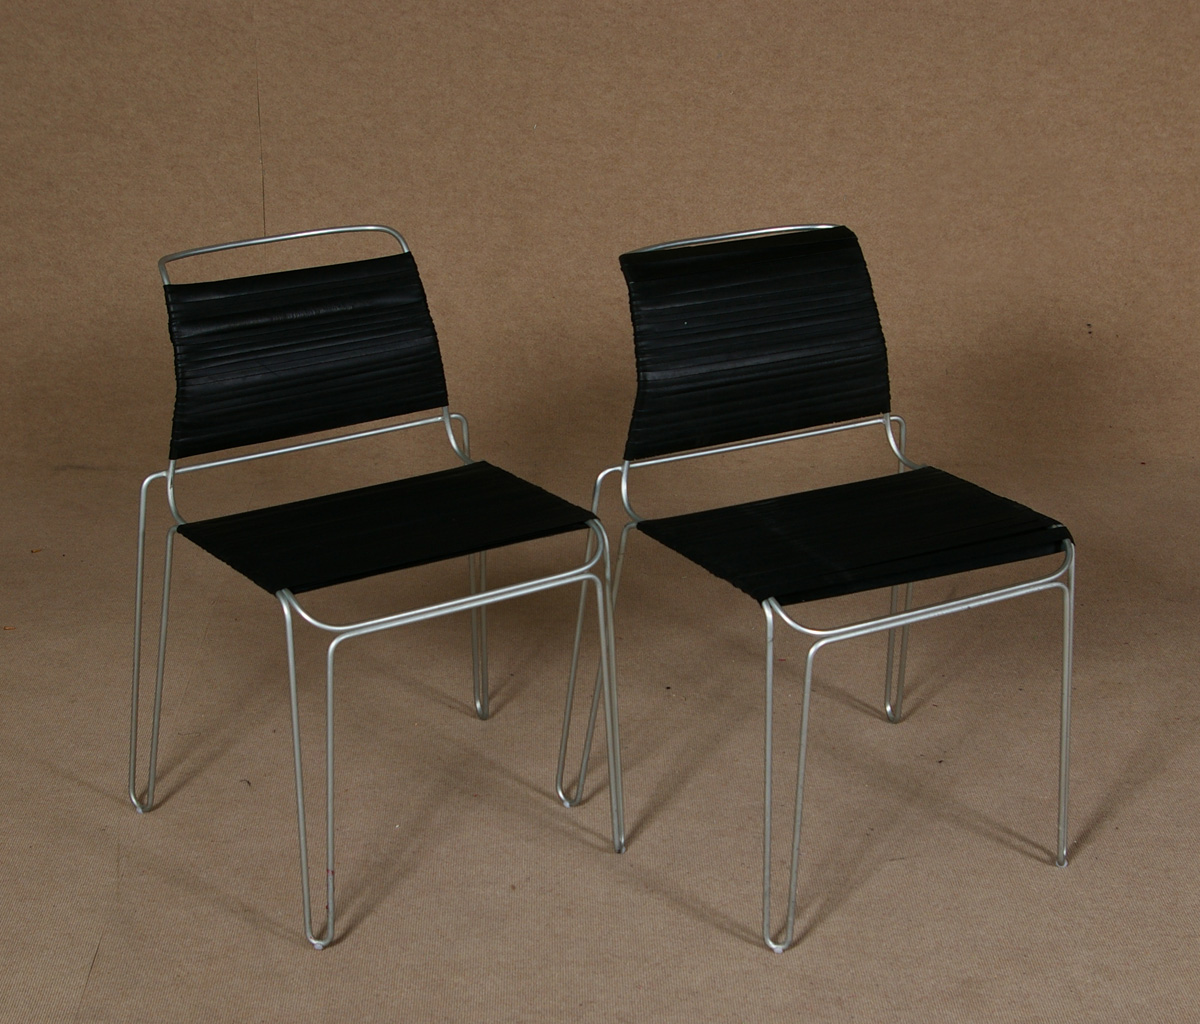 Tom Dixon Rubber Band Chair Stolar 2 St Lauritz Com